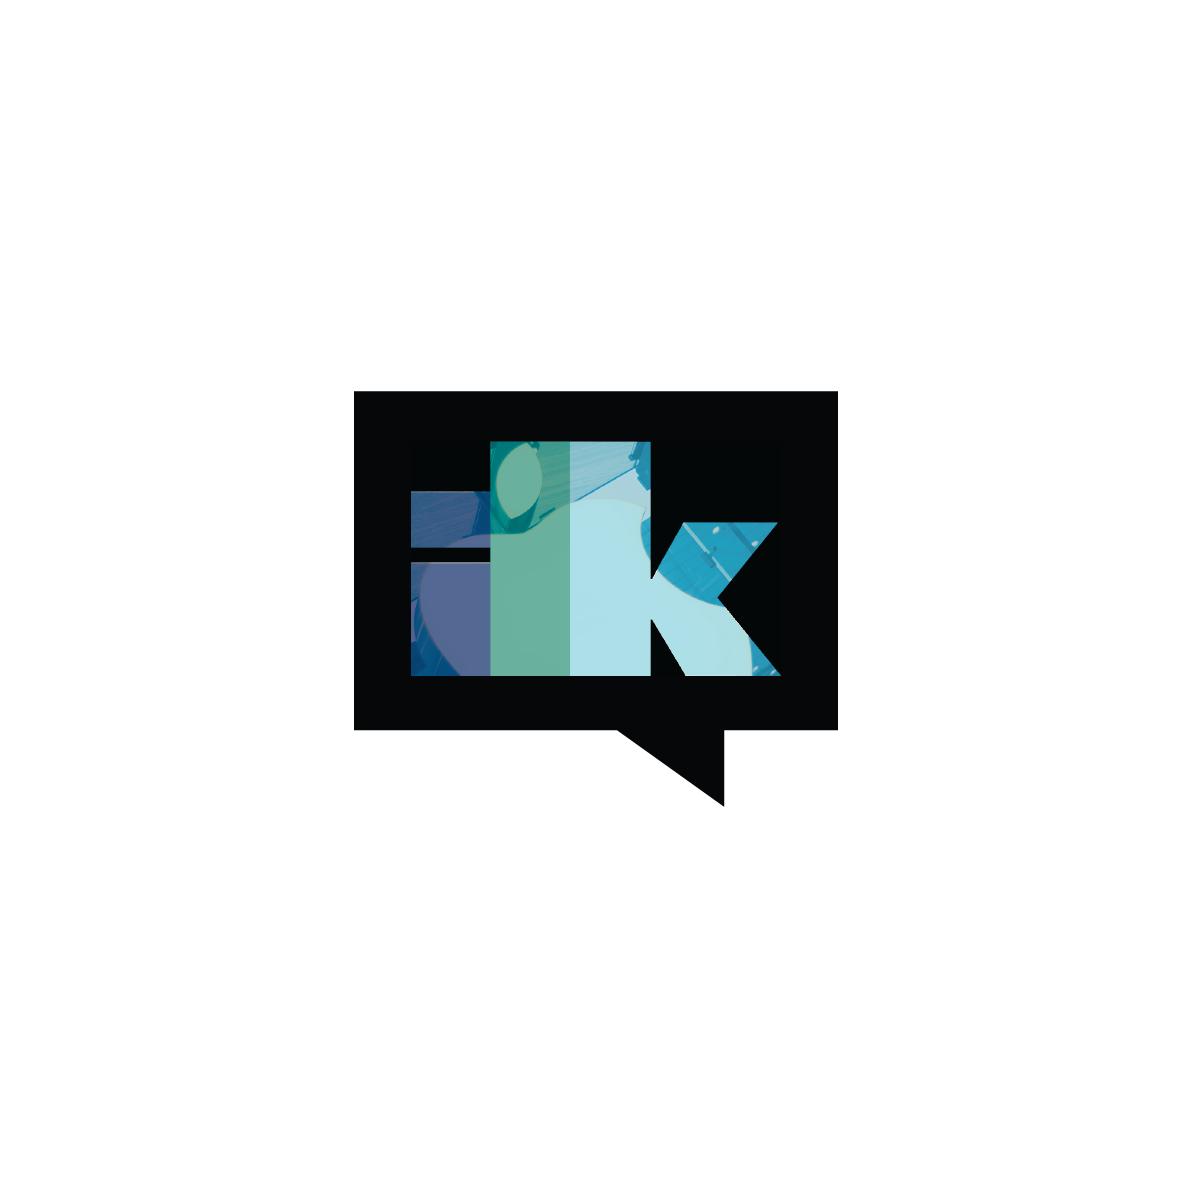 ilk_logo2-01.png